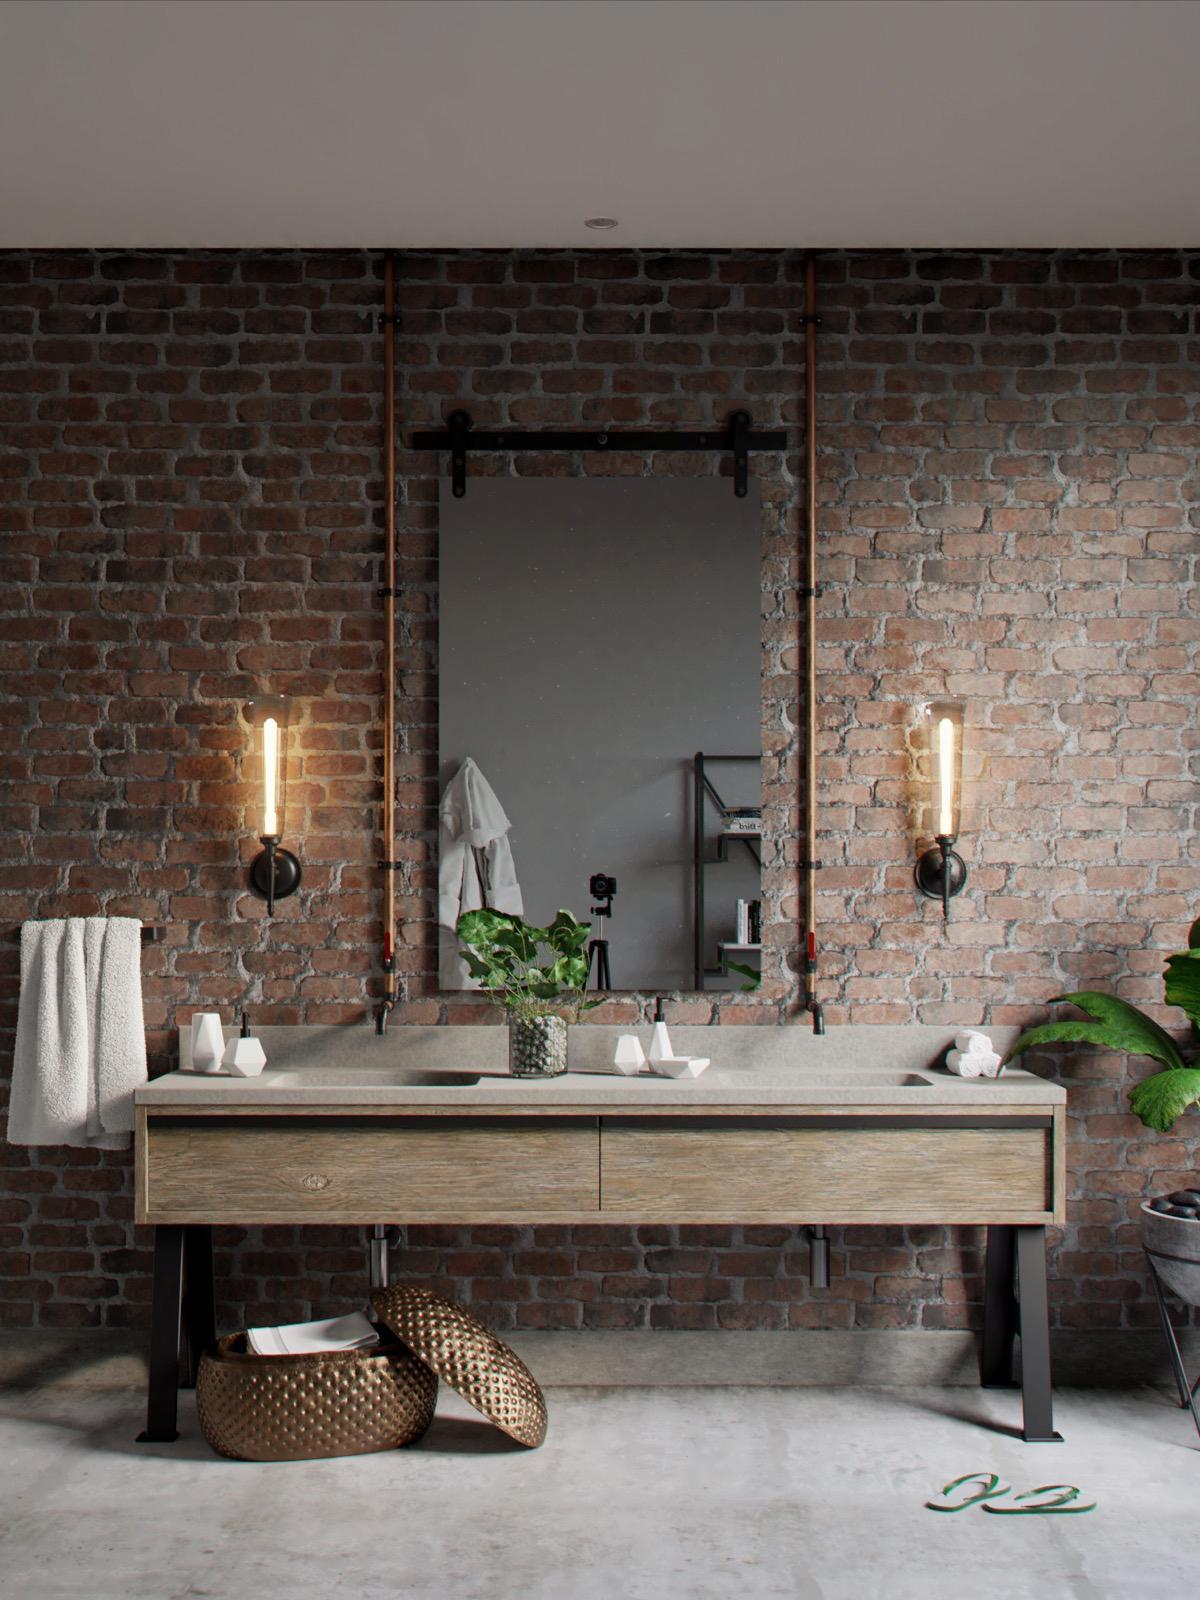 Industrial Style Bathroom Ideas Industrial Style Bathroom Ideas to Glam up Your Home industrial style bathroom mirror